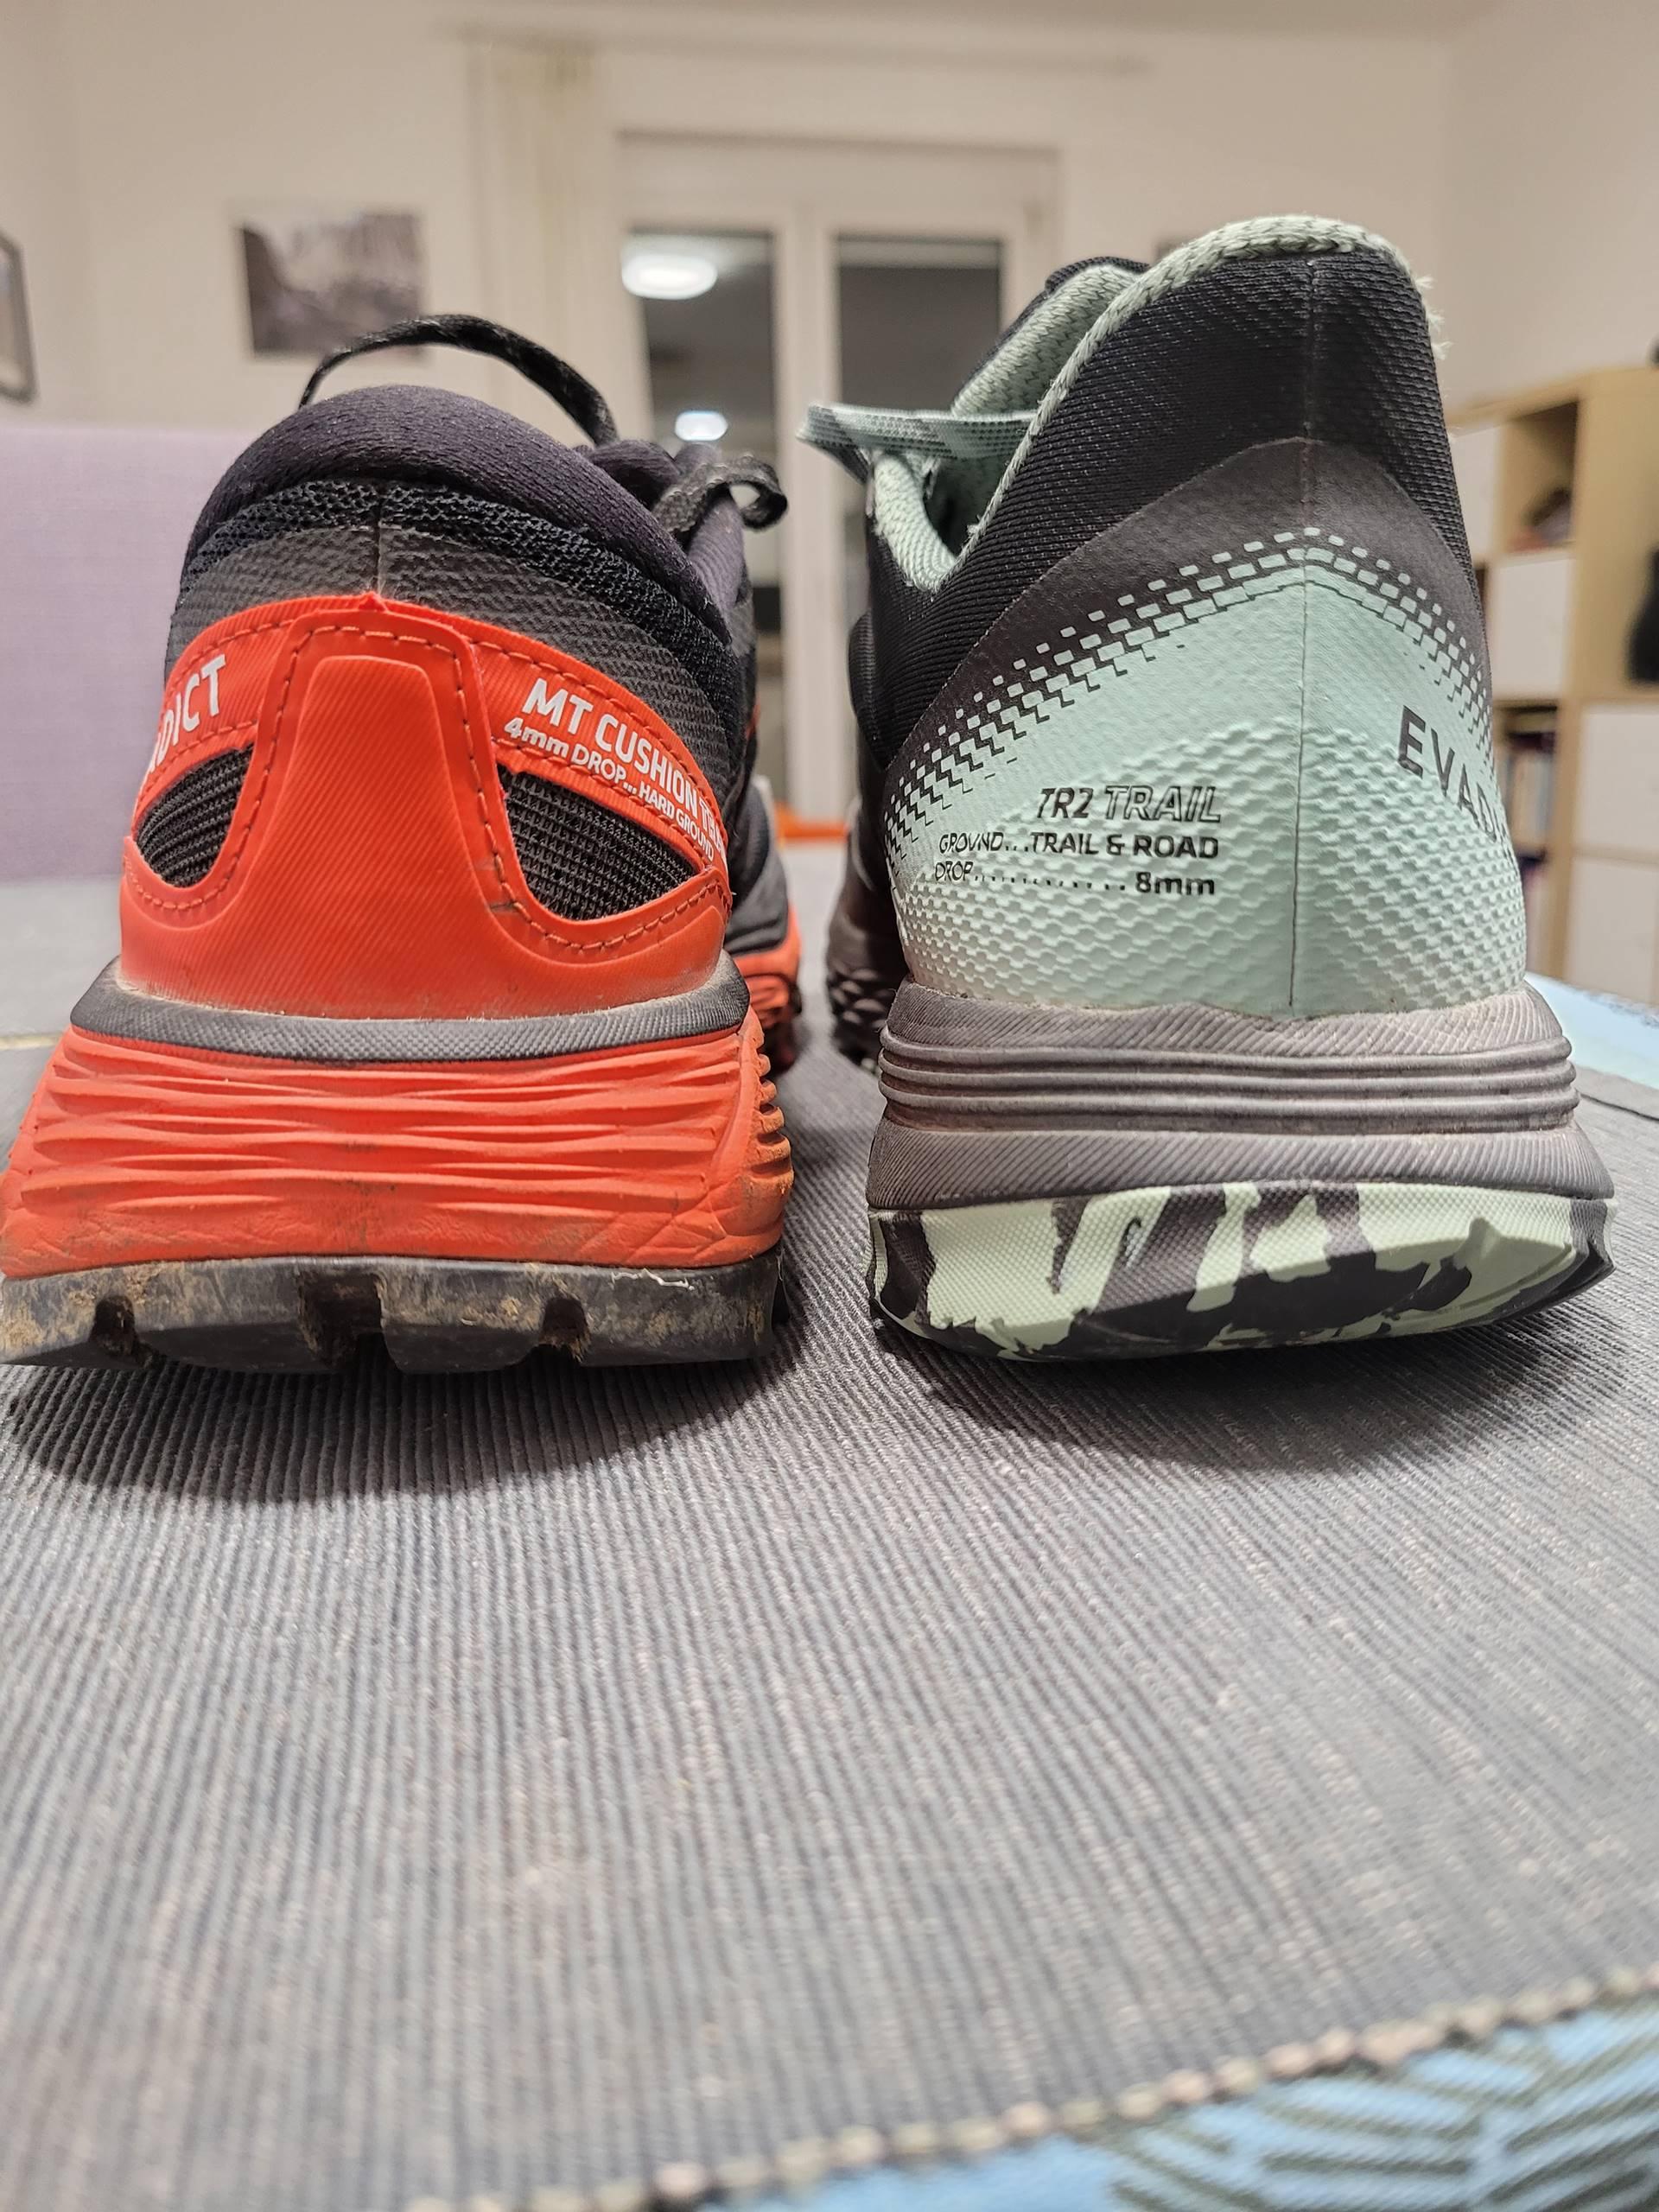 Evadict TR2 Trail futócipő teszt-1